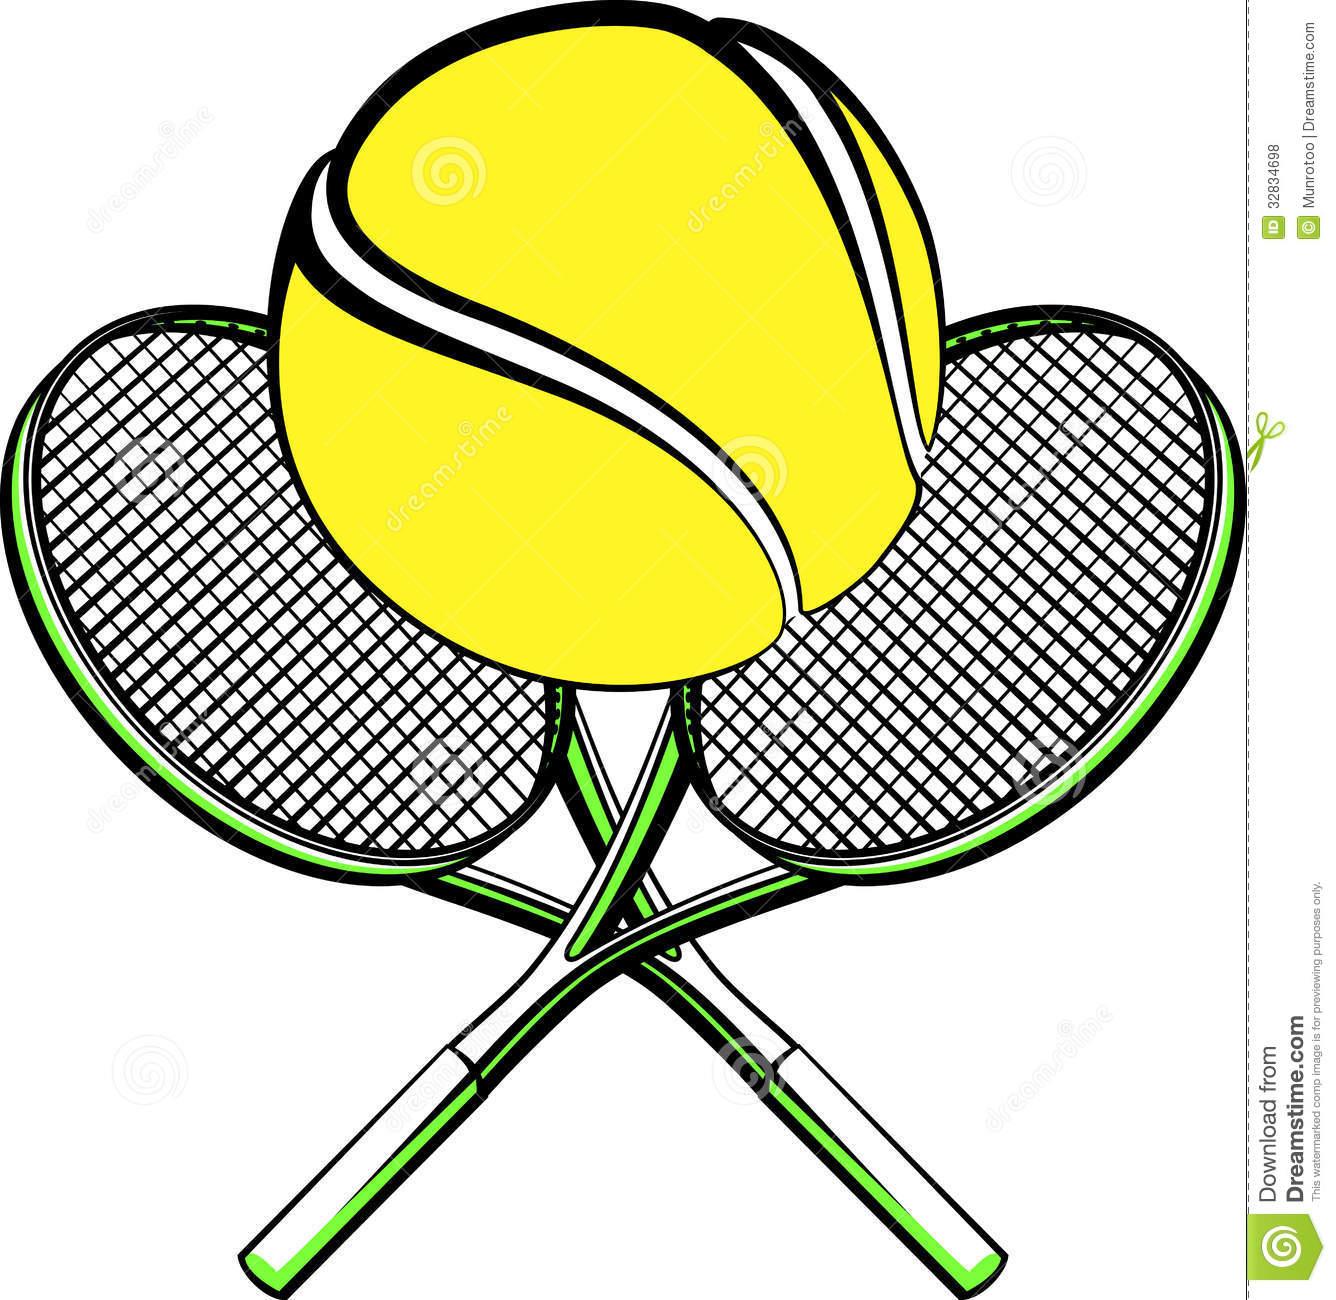 1336x1300 Tennis Racket And Ball Clipart